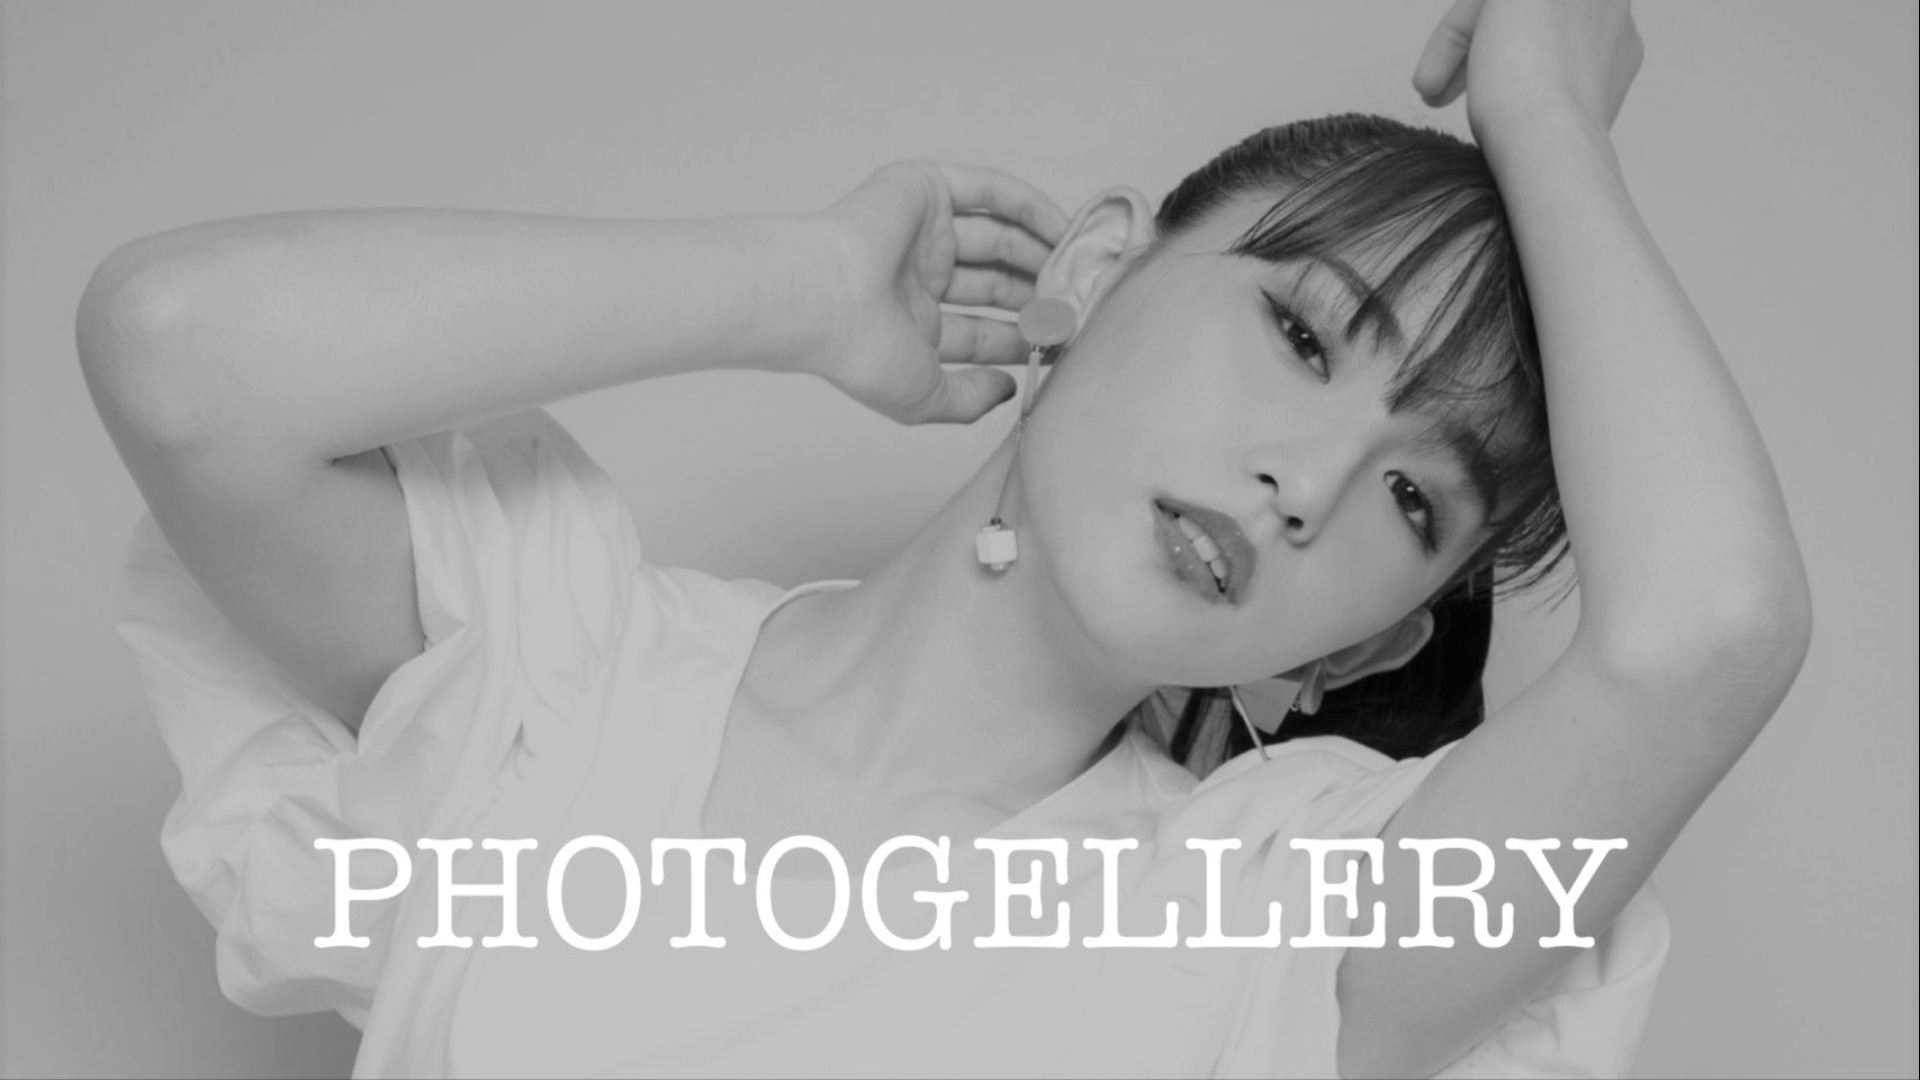 photogallery #1